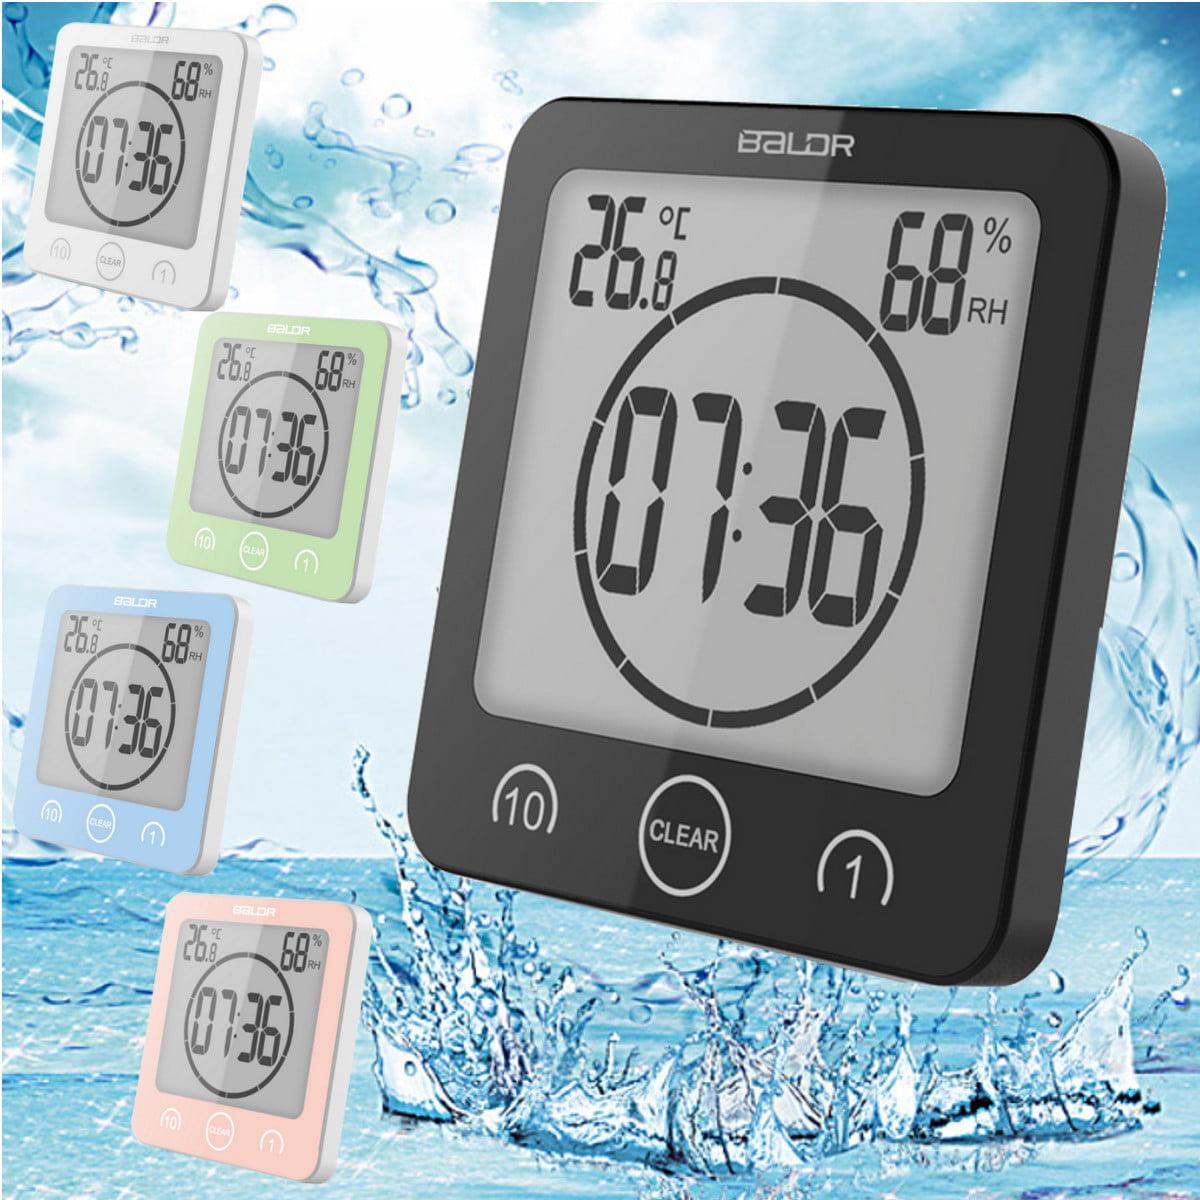 Digital Shower Clock Timer Alarm Temperature Meter Humidity Bathroom Waterproof